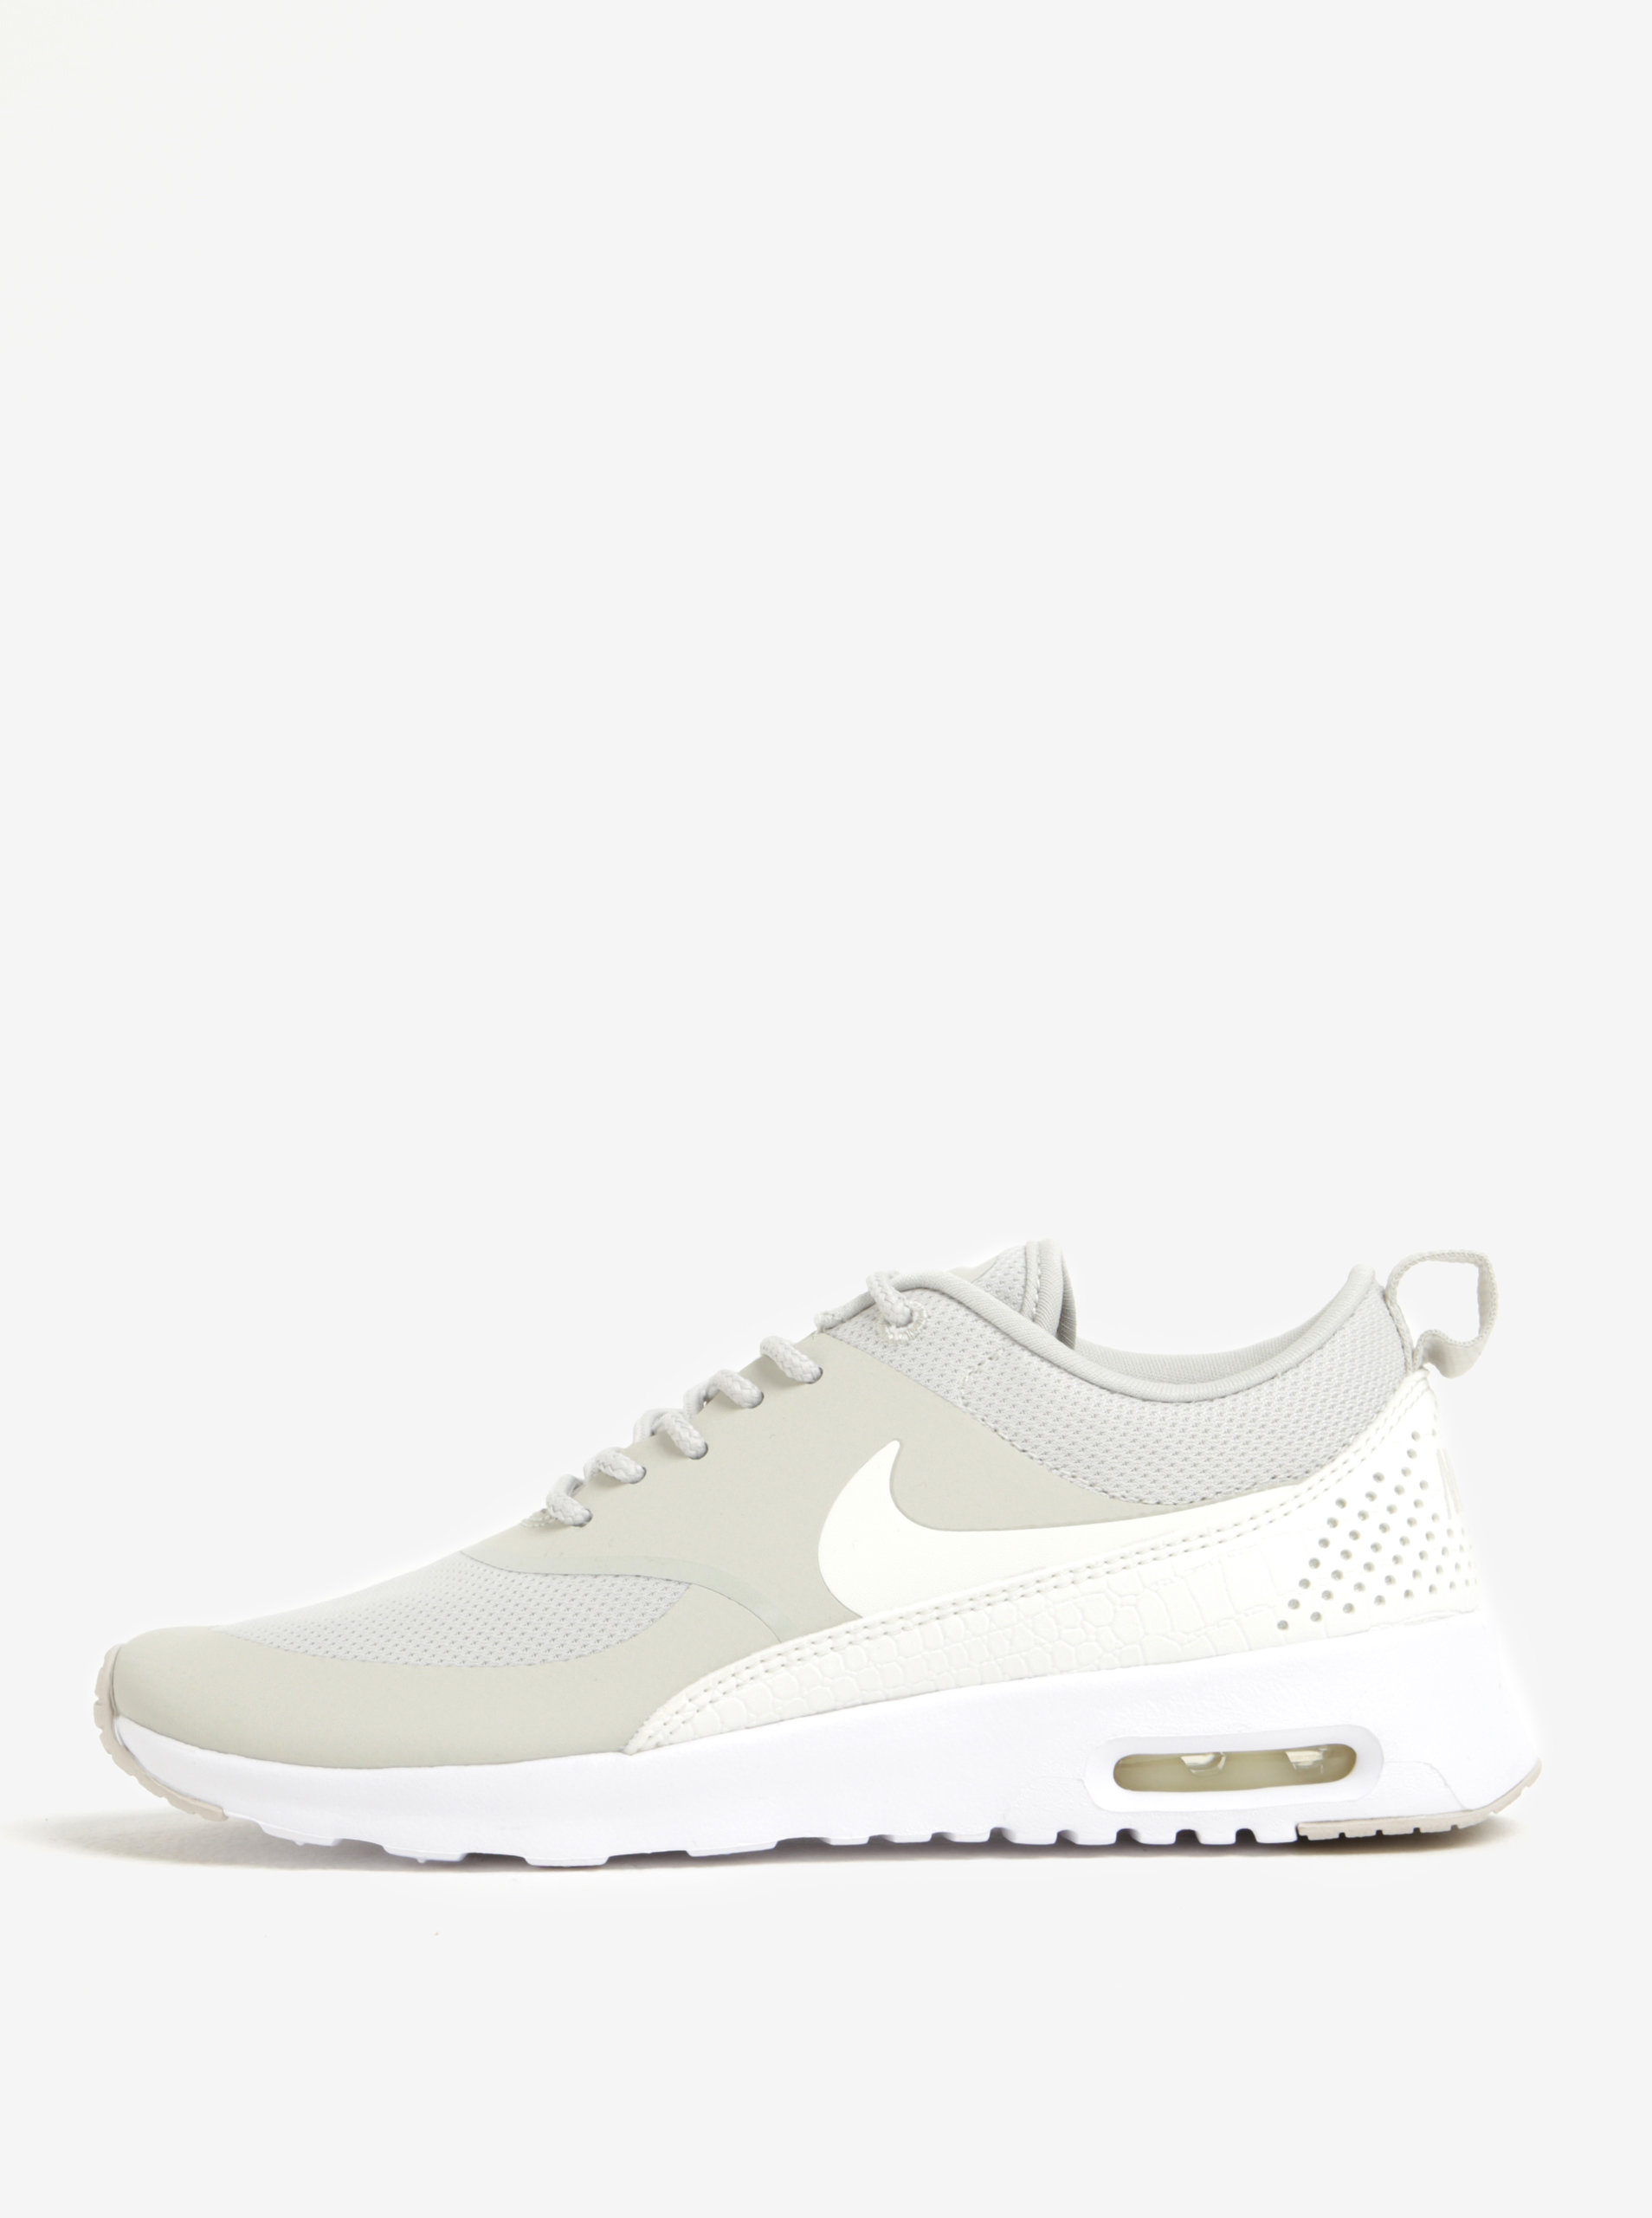 Sivé dámske tenisky Nike Air Max Thea ... 1f6a4e97806